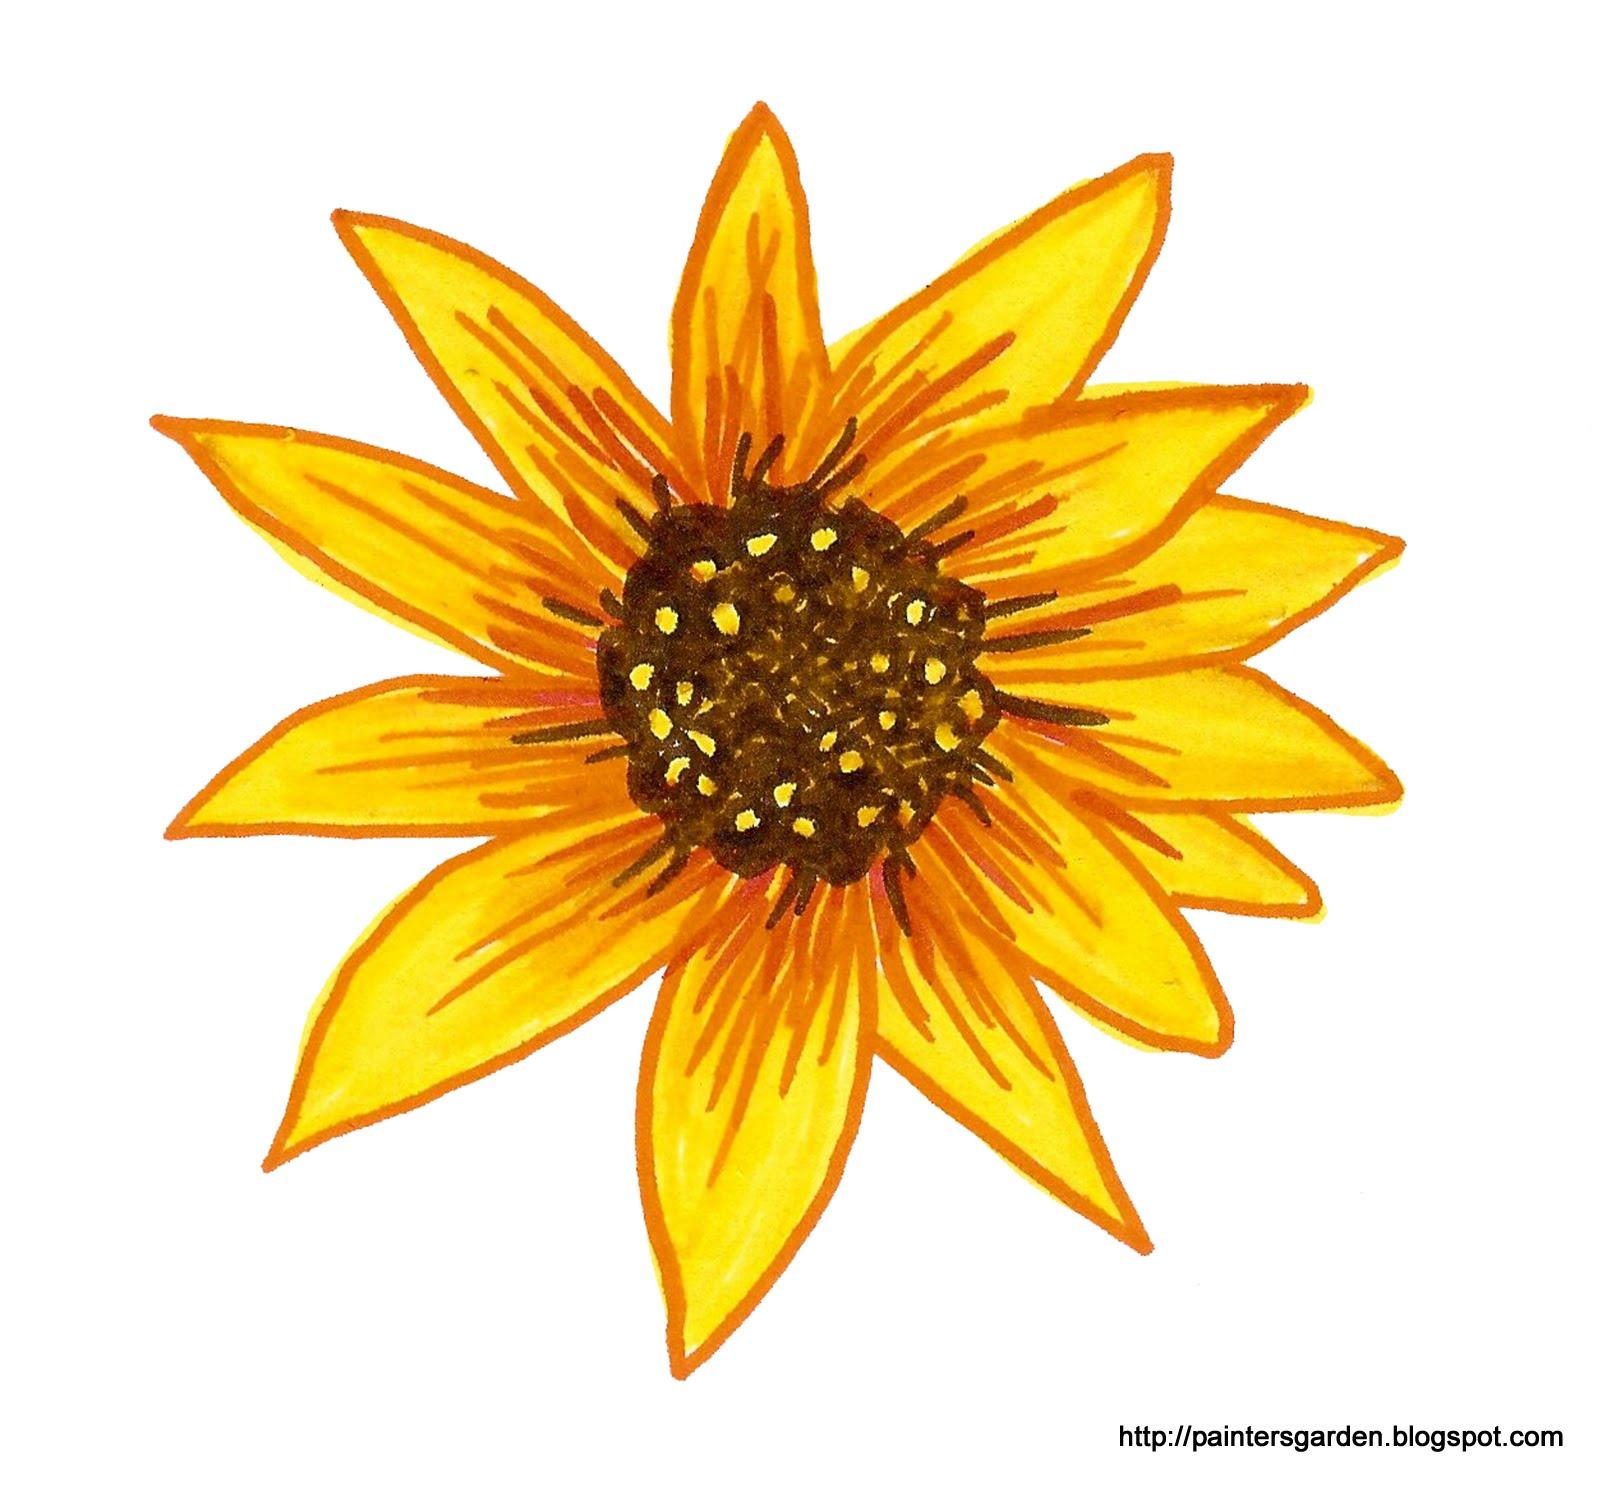 Paintersgarden: Drawing sunflowers in marker